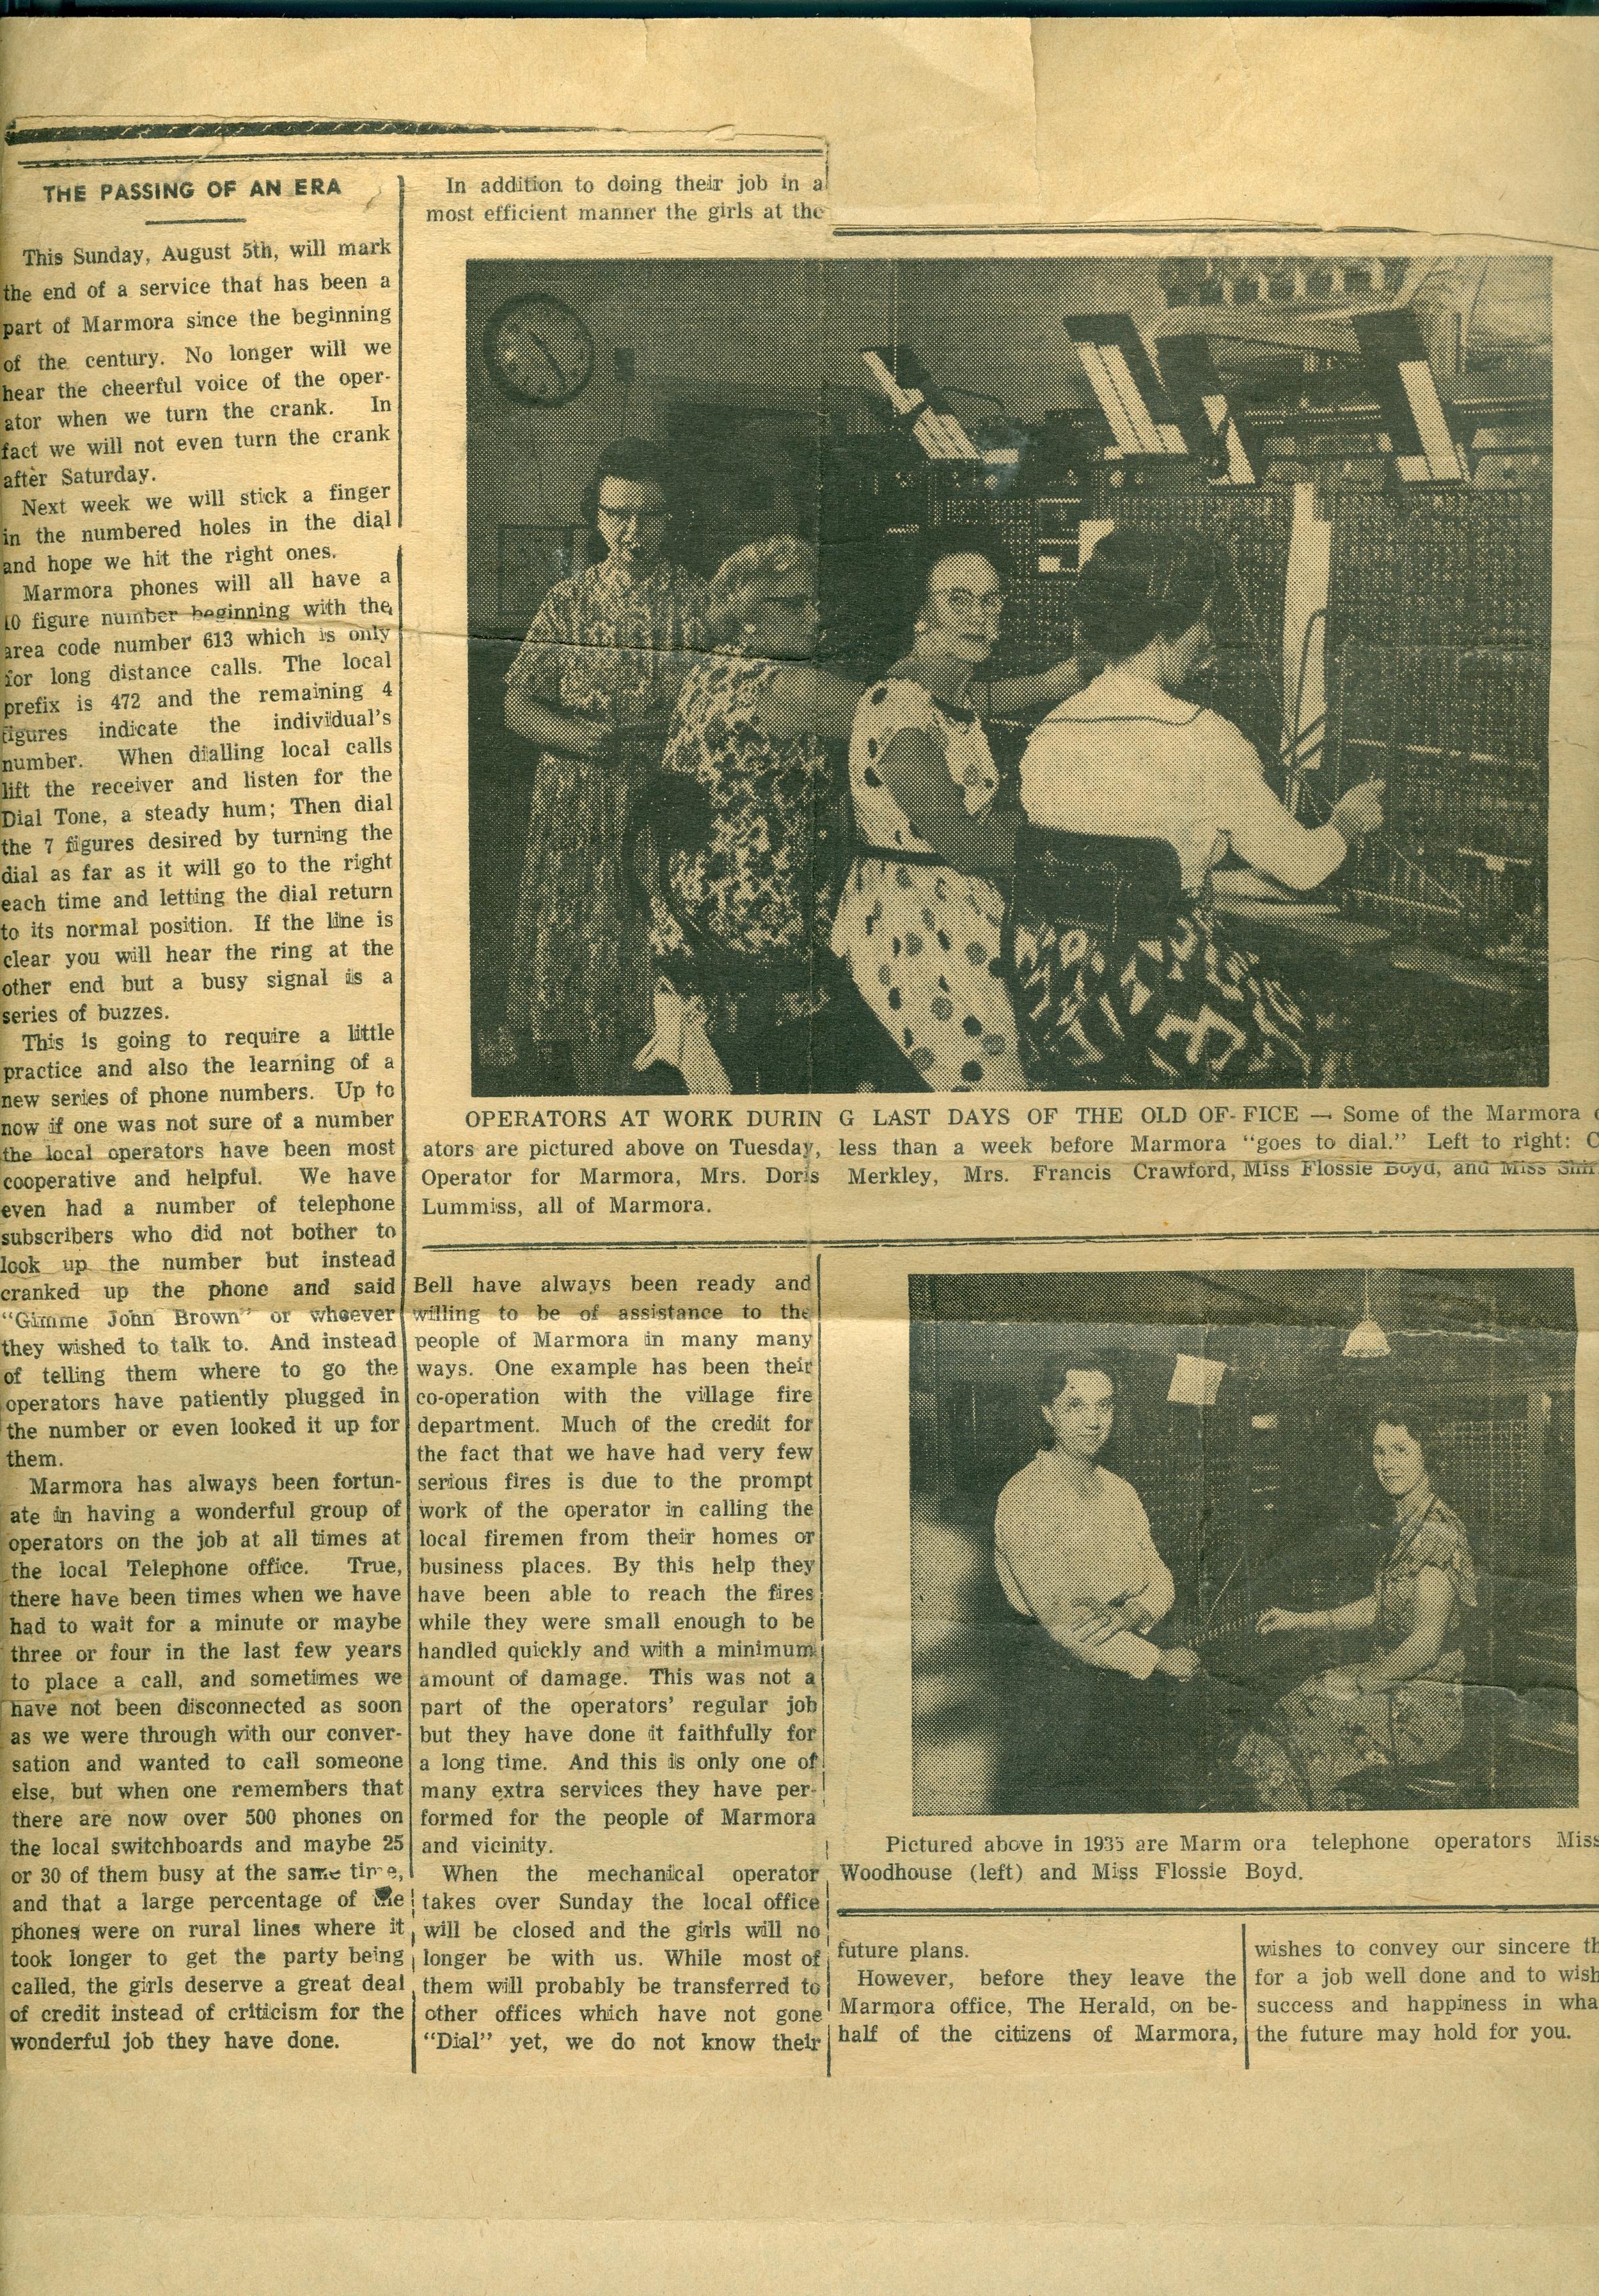 1935 Marmora Telephone Co. , Doris Merkley, Mrs. Francis Crawford, Flossie Boyd, Shirley Lummiss, V. Woodhouse (circa 1935)